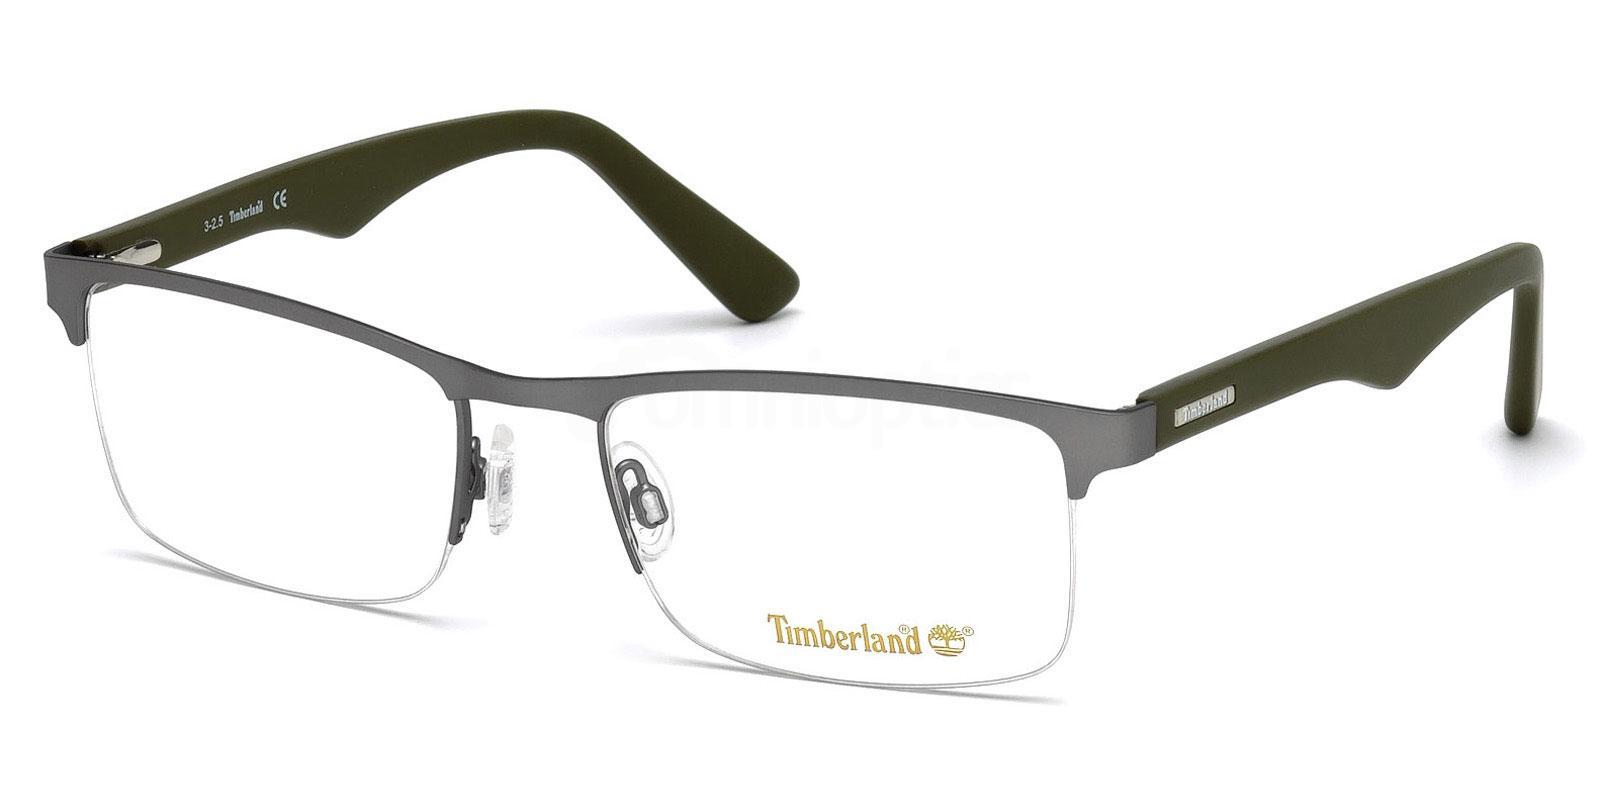 013 TB1371 Glasses, Timberland